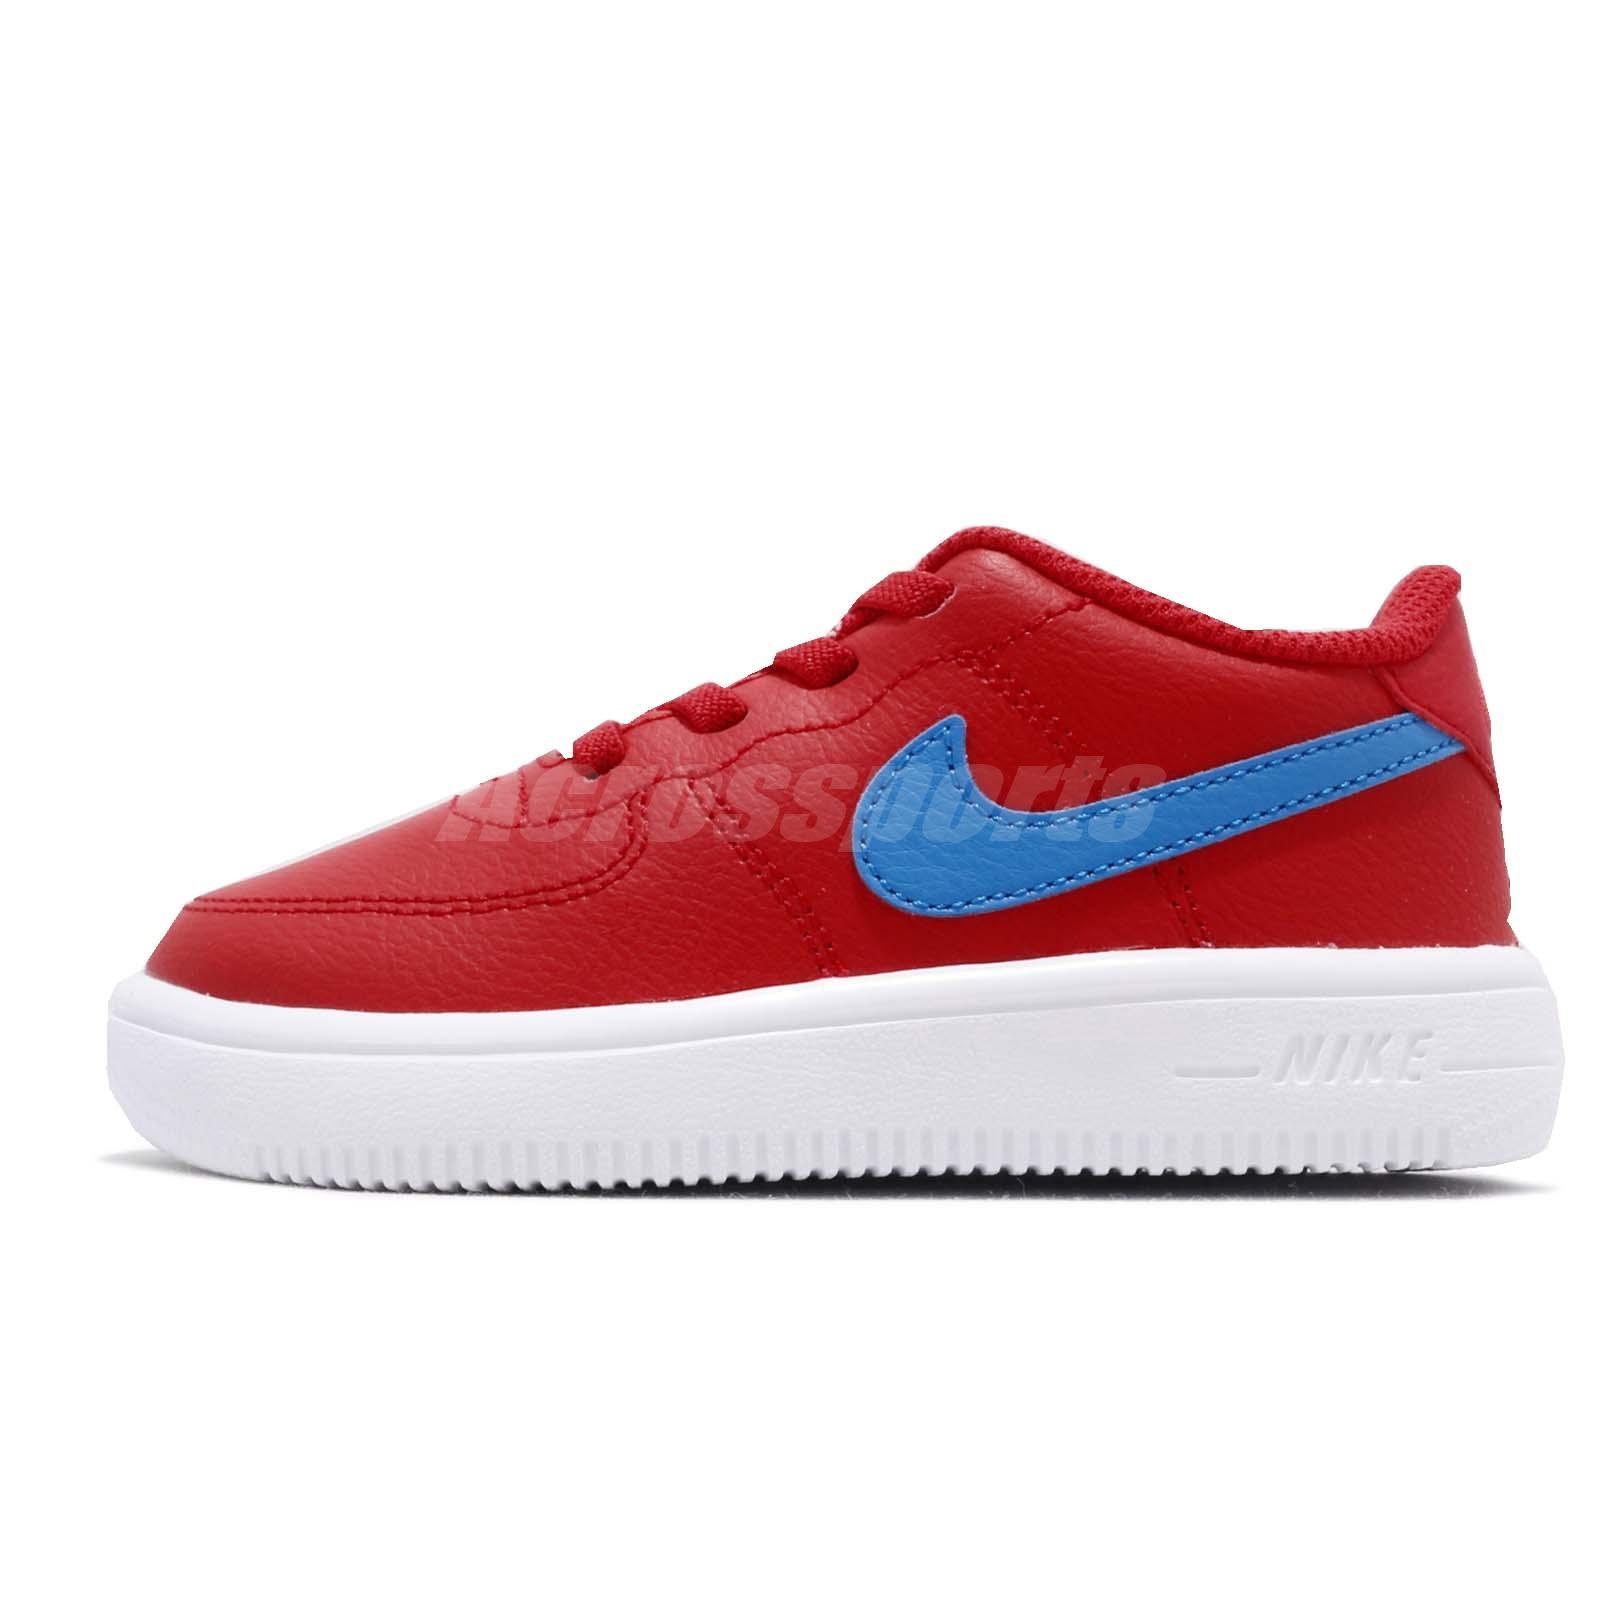 buy popular 255ba 77d82 Nike Force 1 18 TD University Red Photo Blue Toddler Infant Shoes 905220-604